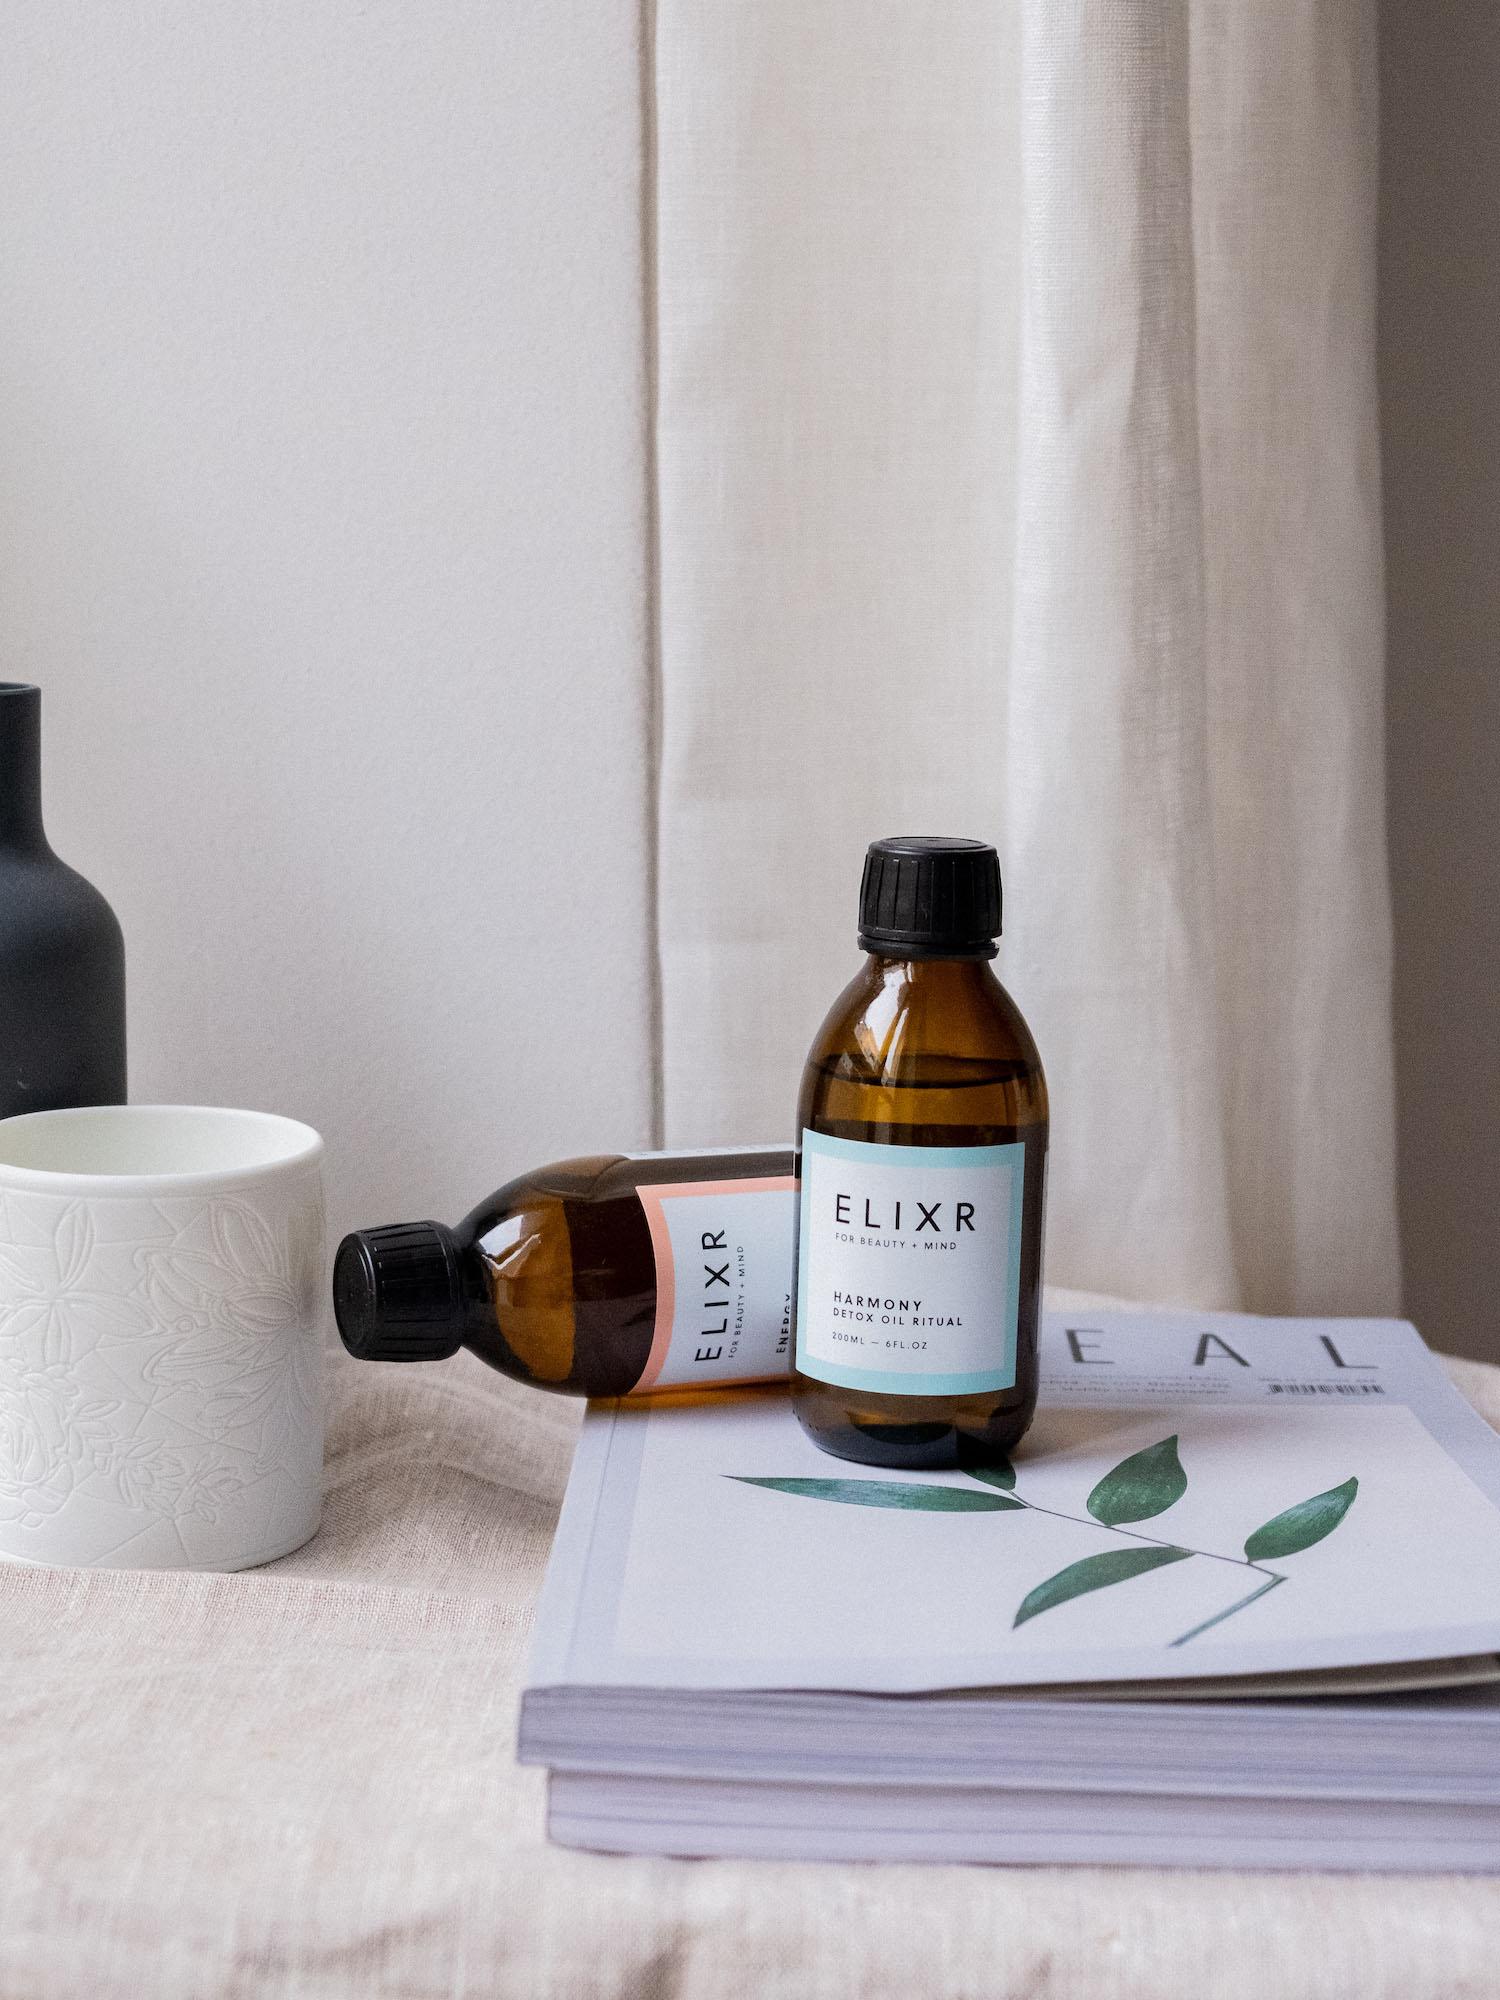 Beautyblog Bare Minds Ölziehen mit Elixr